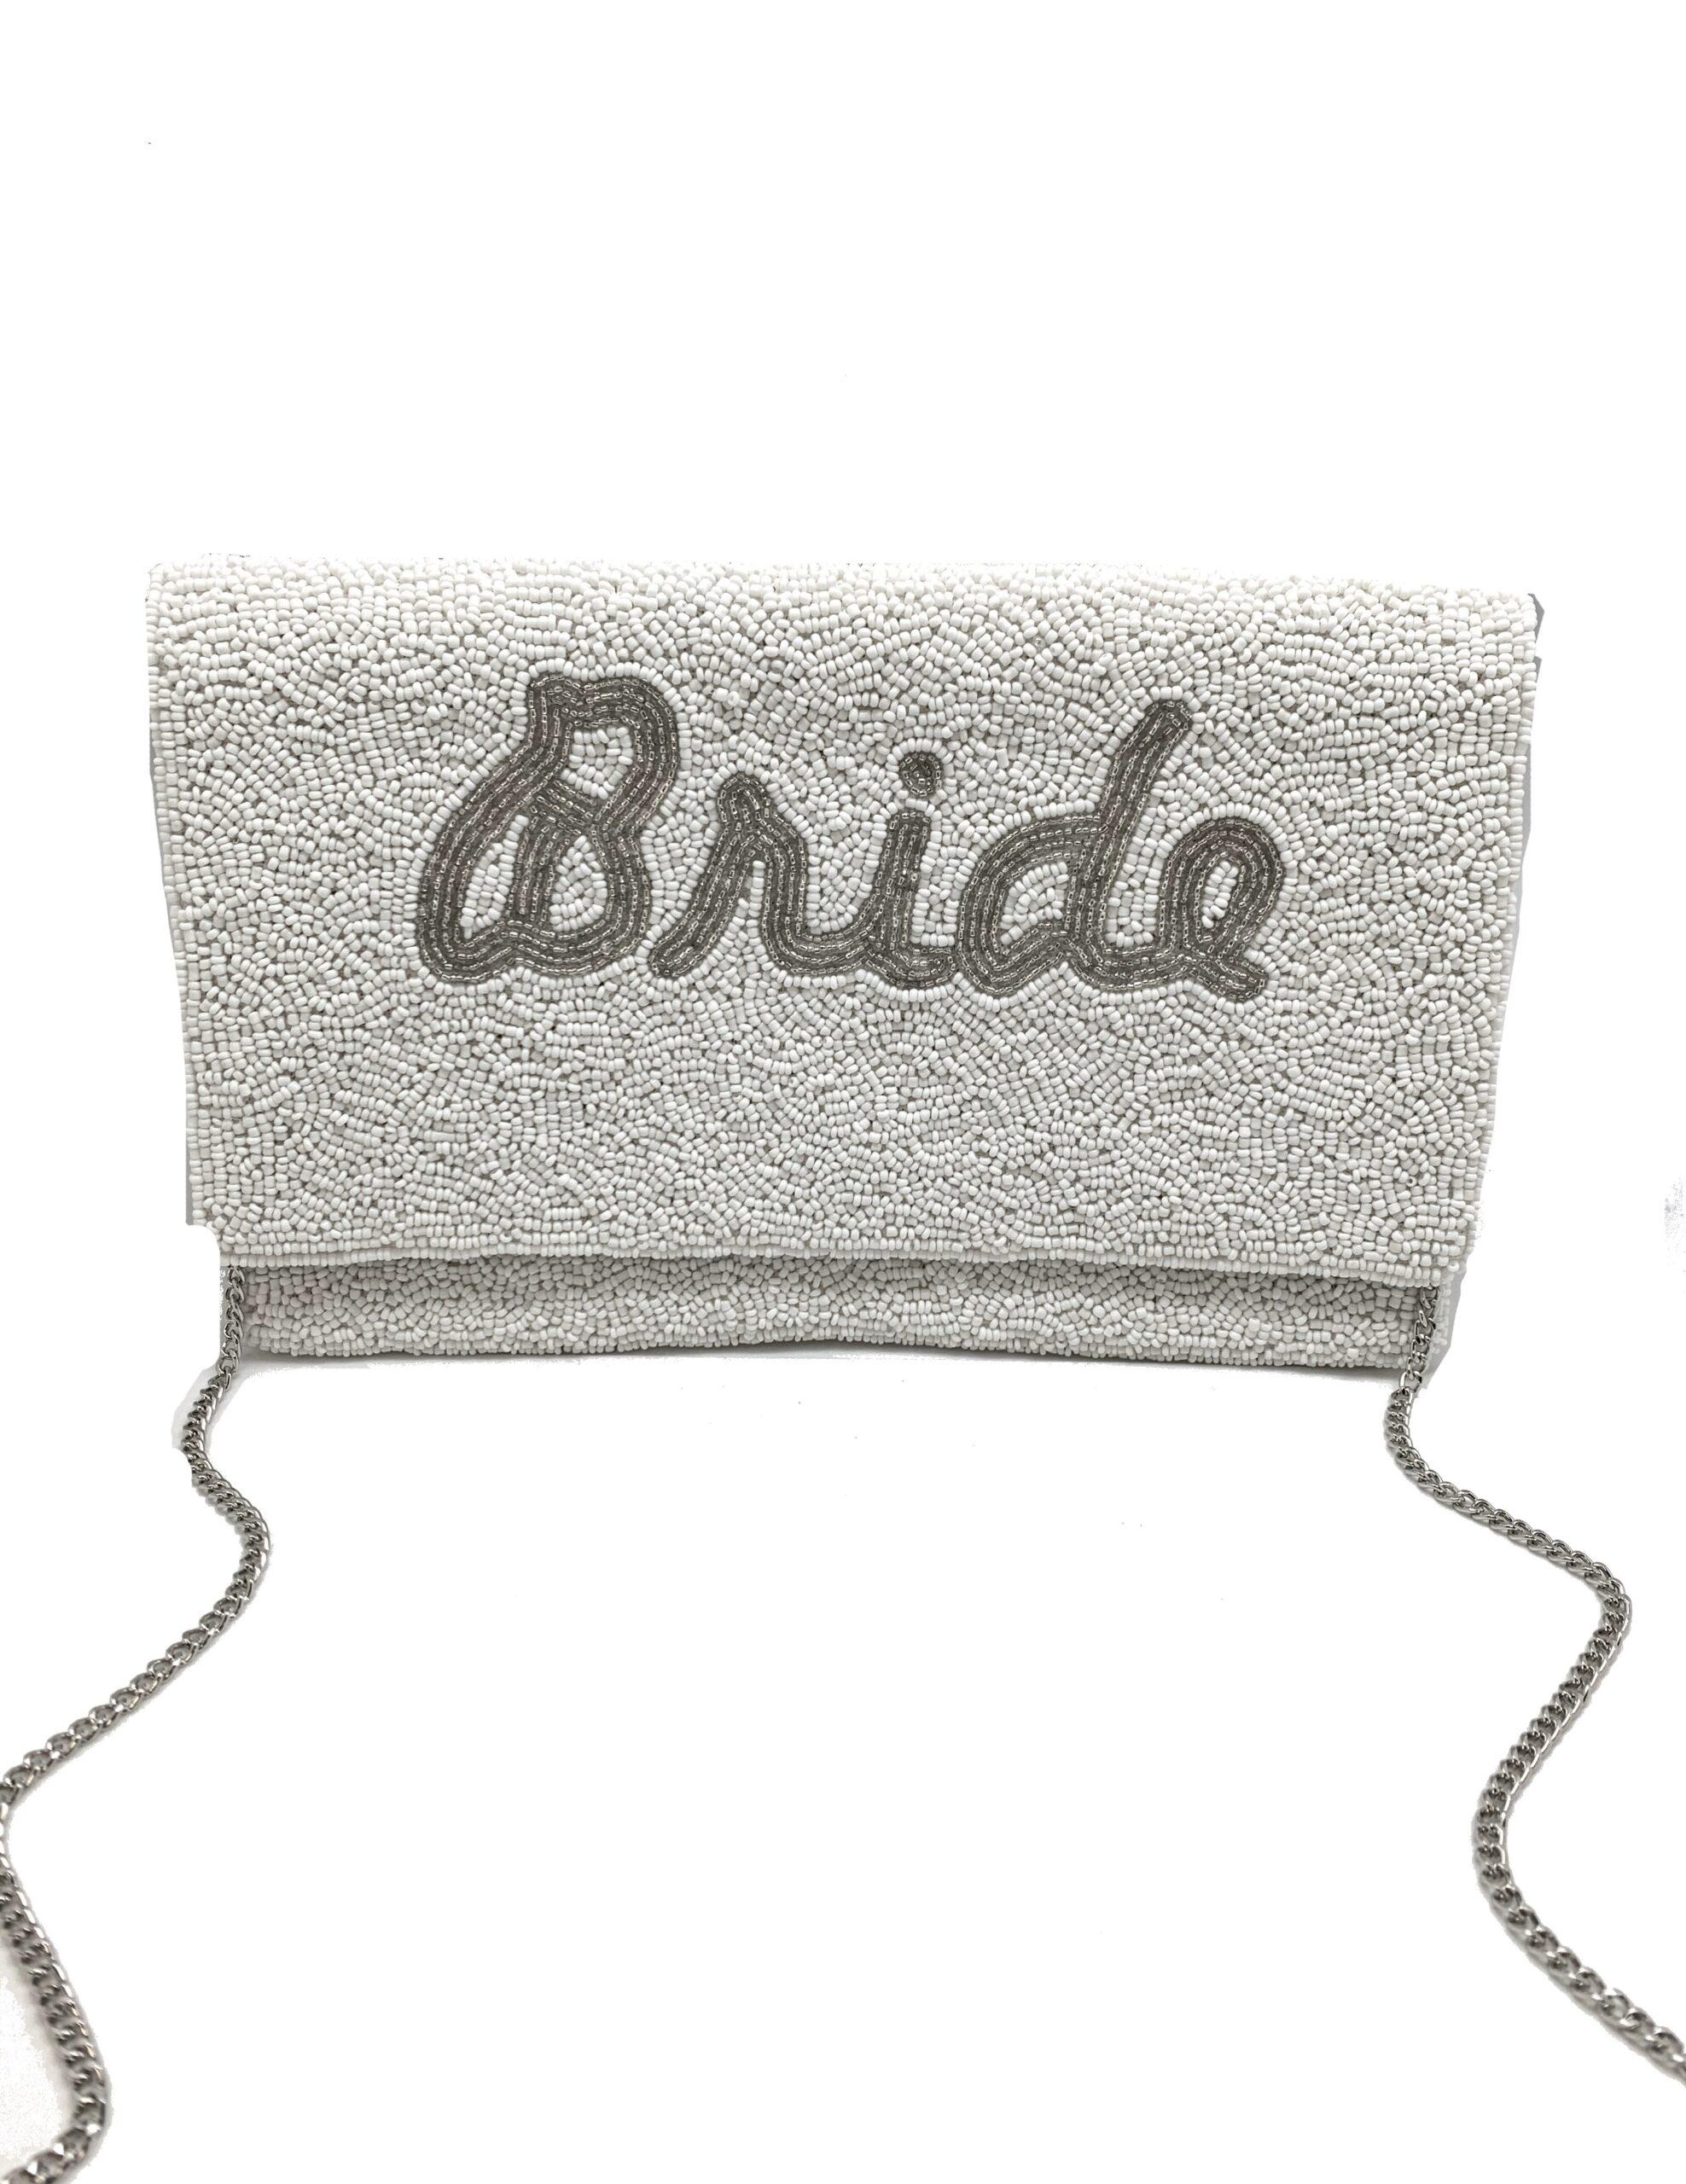 "SILVER"" BRIDE"" CLUTCH"